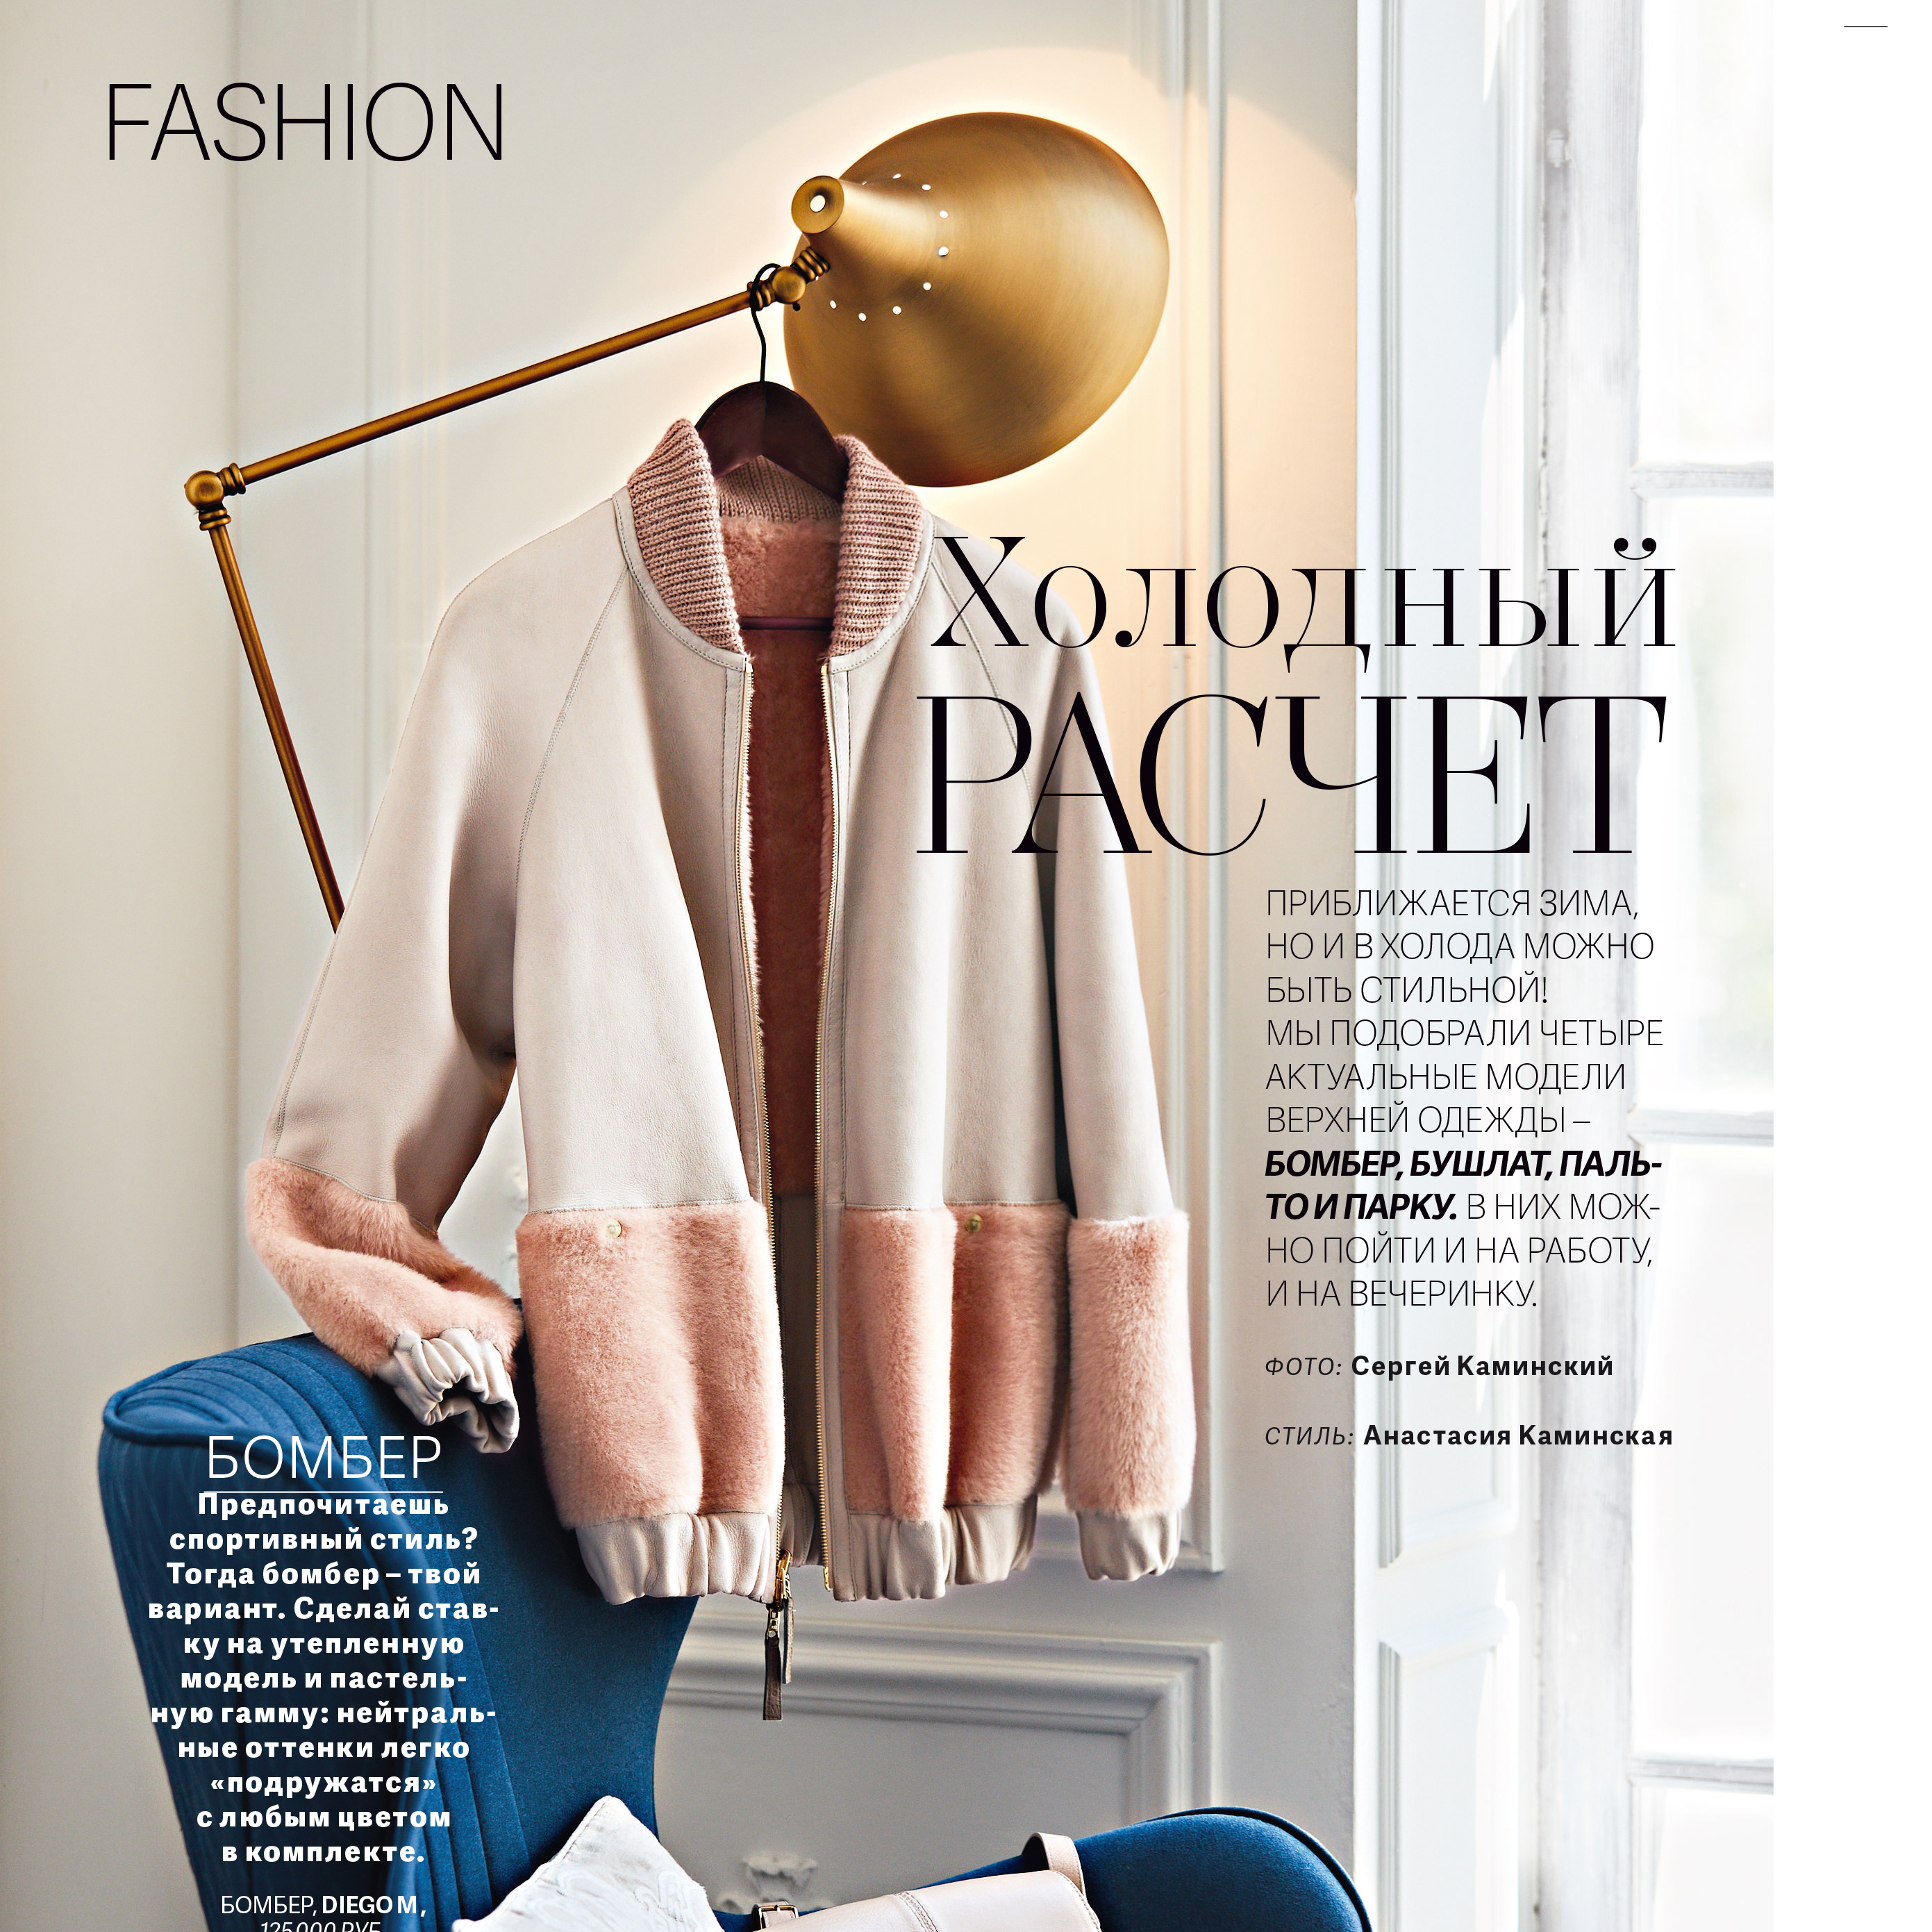 Съемка для журнала Cosmopolitan